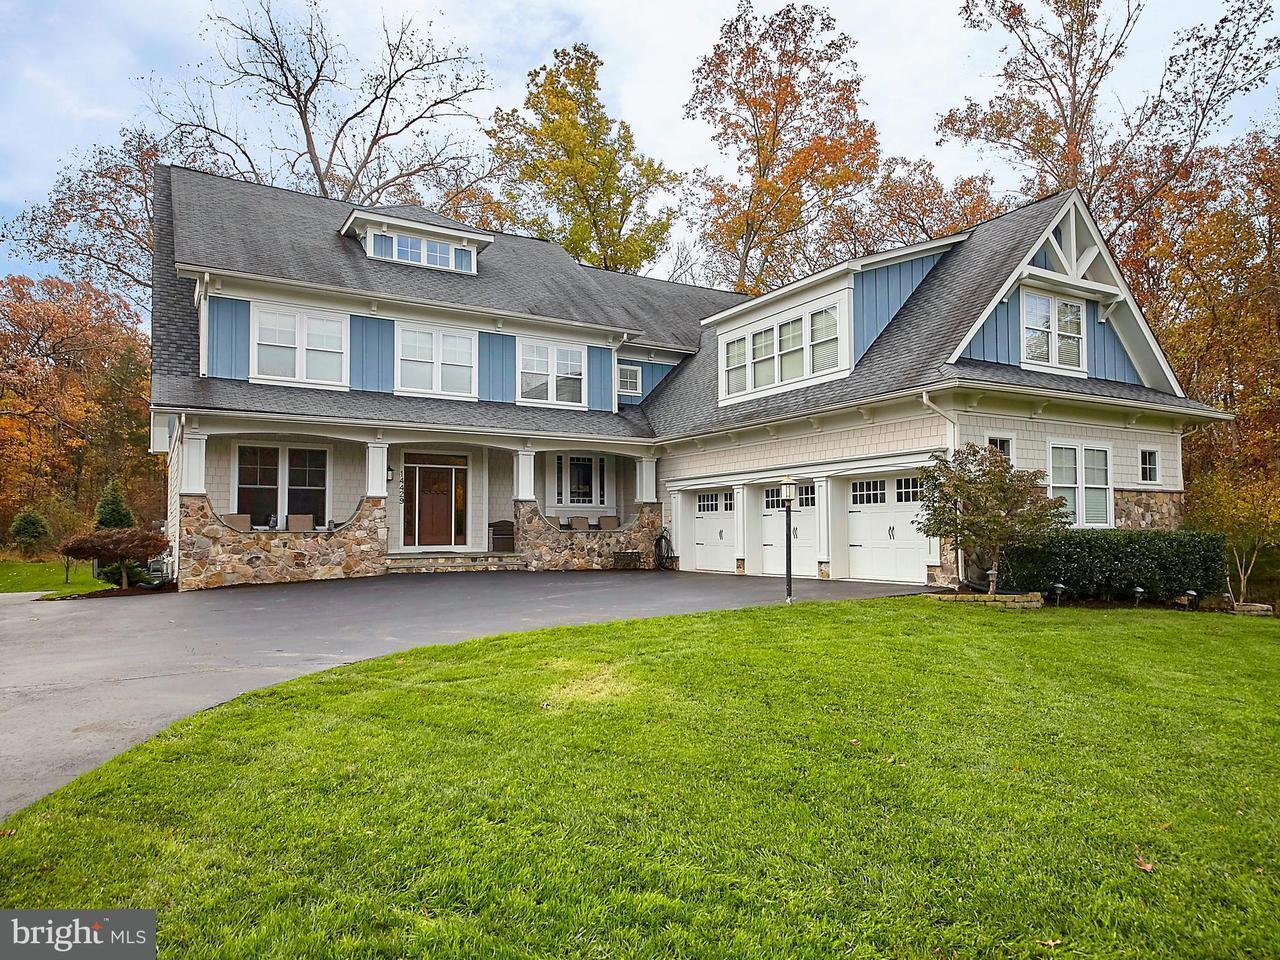 独户住宅 为 销售 在 14429 EAGLE ISLAND Court 14429 EAGLE ISLAND Court Gainesville, 弗吉尼亚州 20155 美国